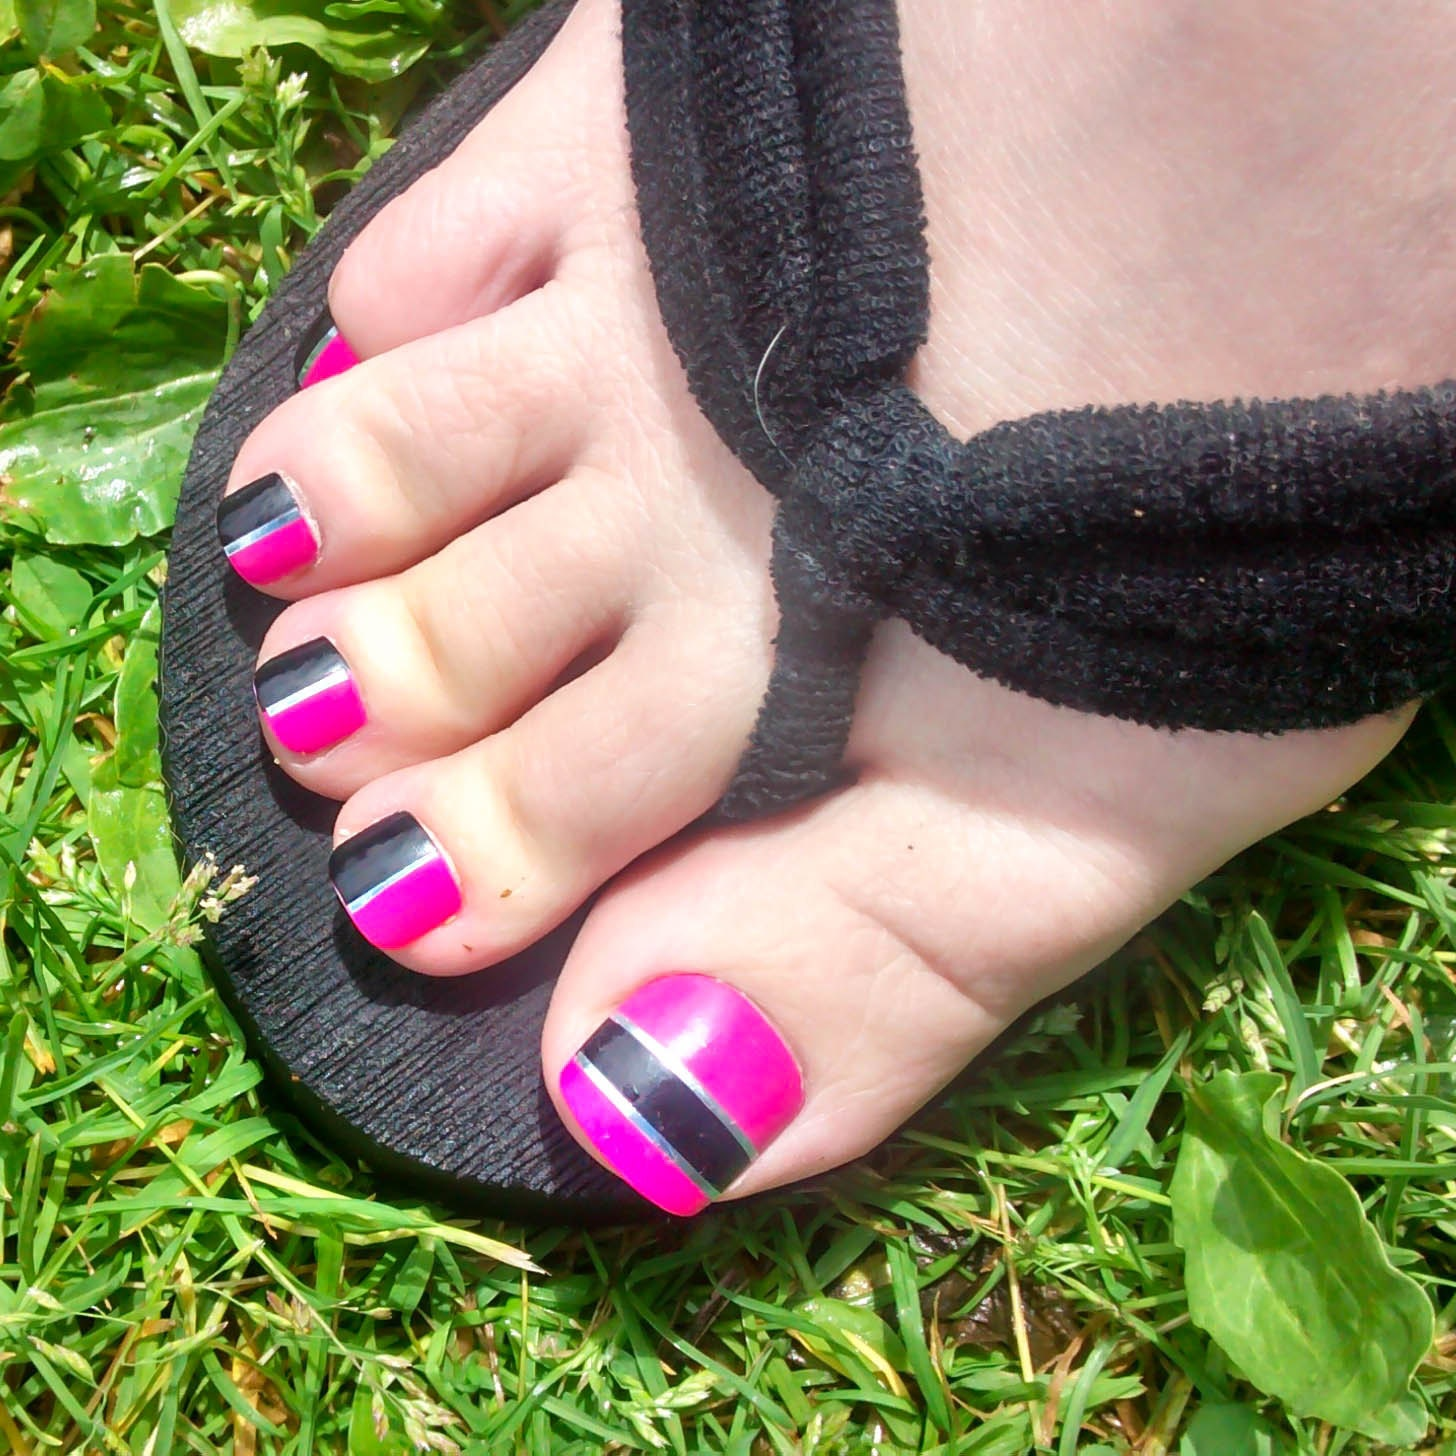 Hot Pink Fake Toenails, Toenails, Toe Nail, Press on, Acrylic ...